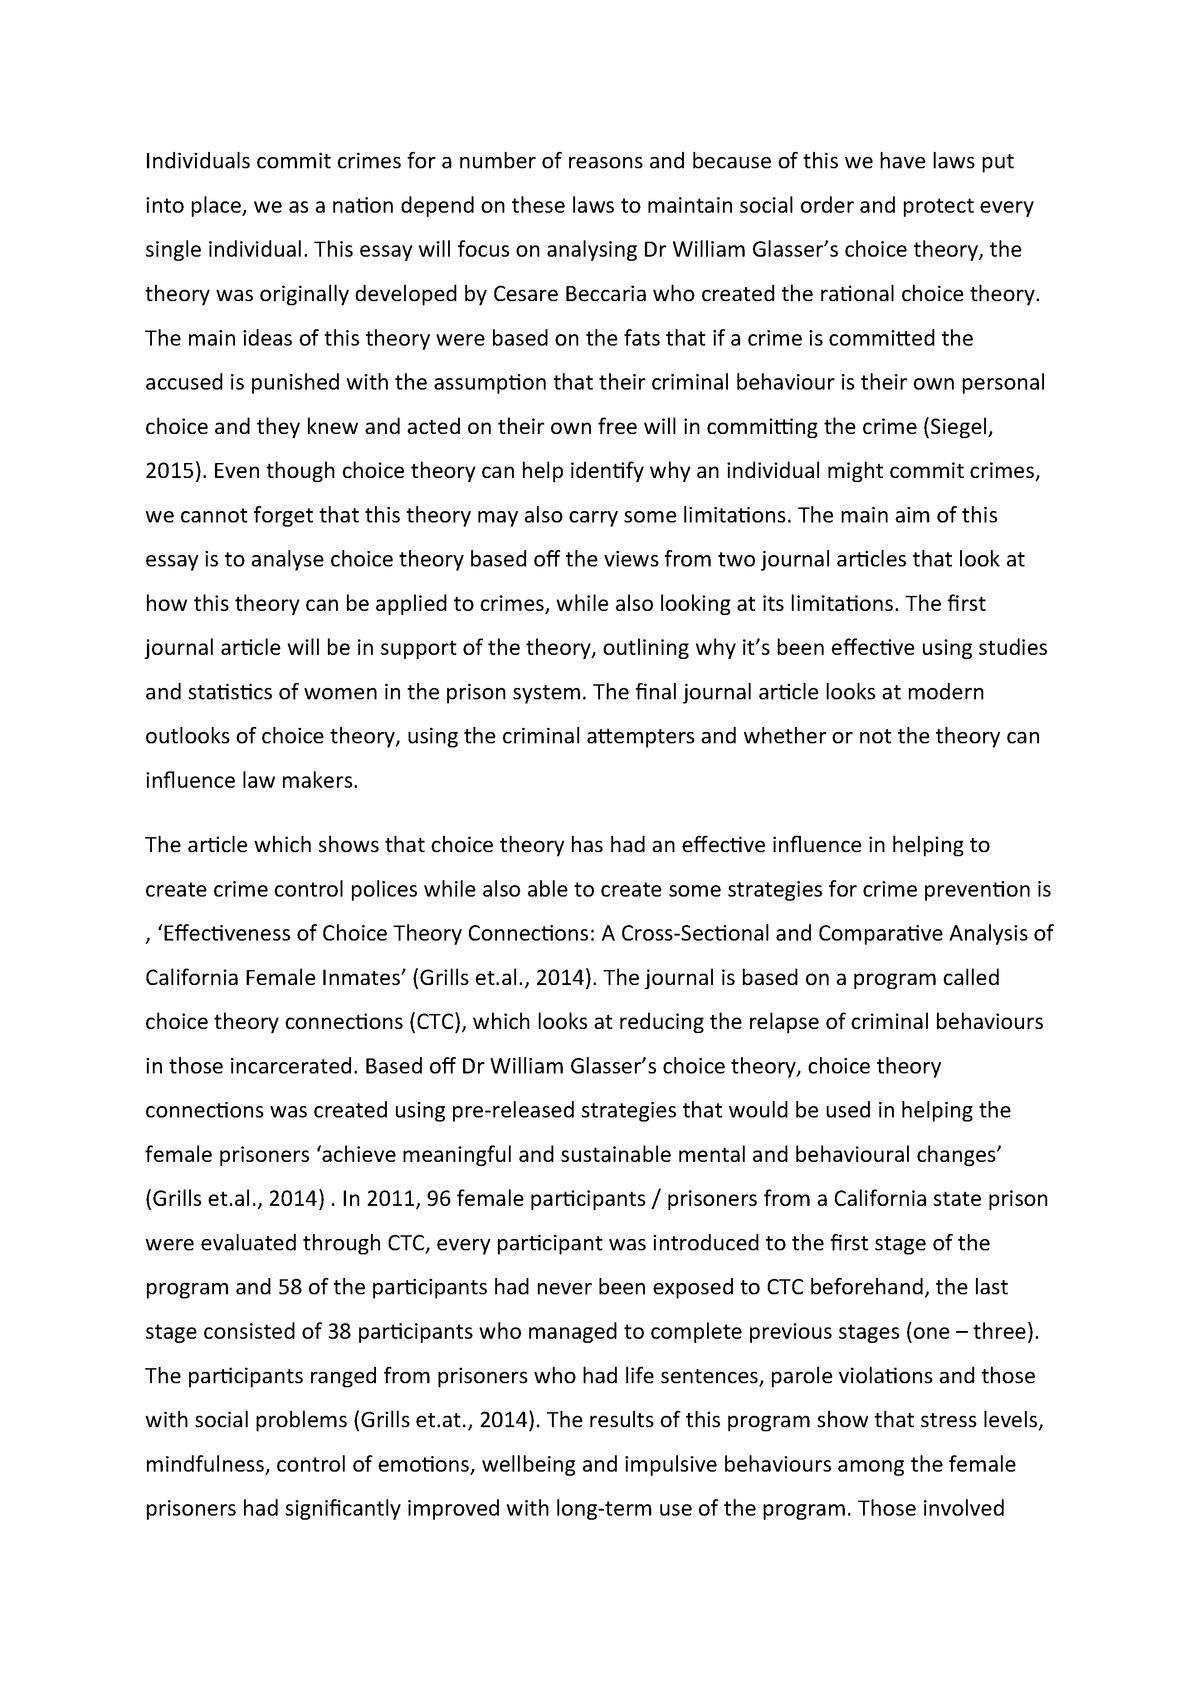 Prison effectiveness essay